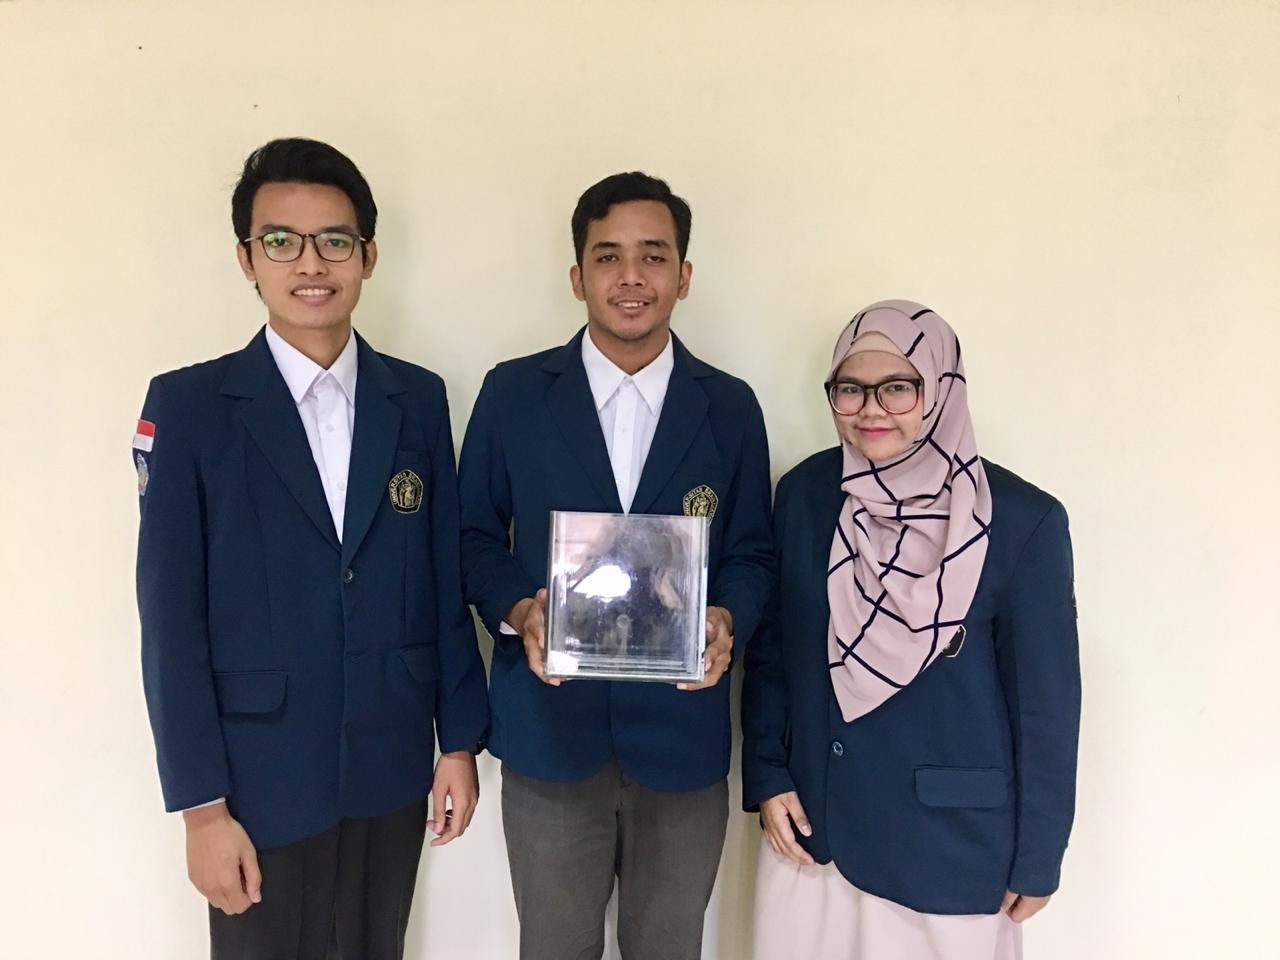 Dari Kiri ke Kanan: Rizhaf Setyo Hartono, Hendra Surawijaya, dan Elfahra Casanza Amada. (Foto: istimewa)